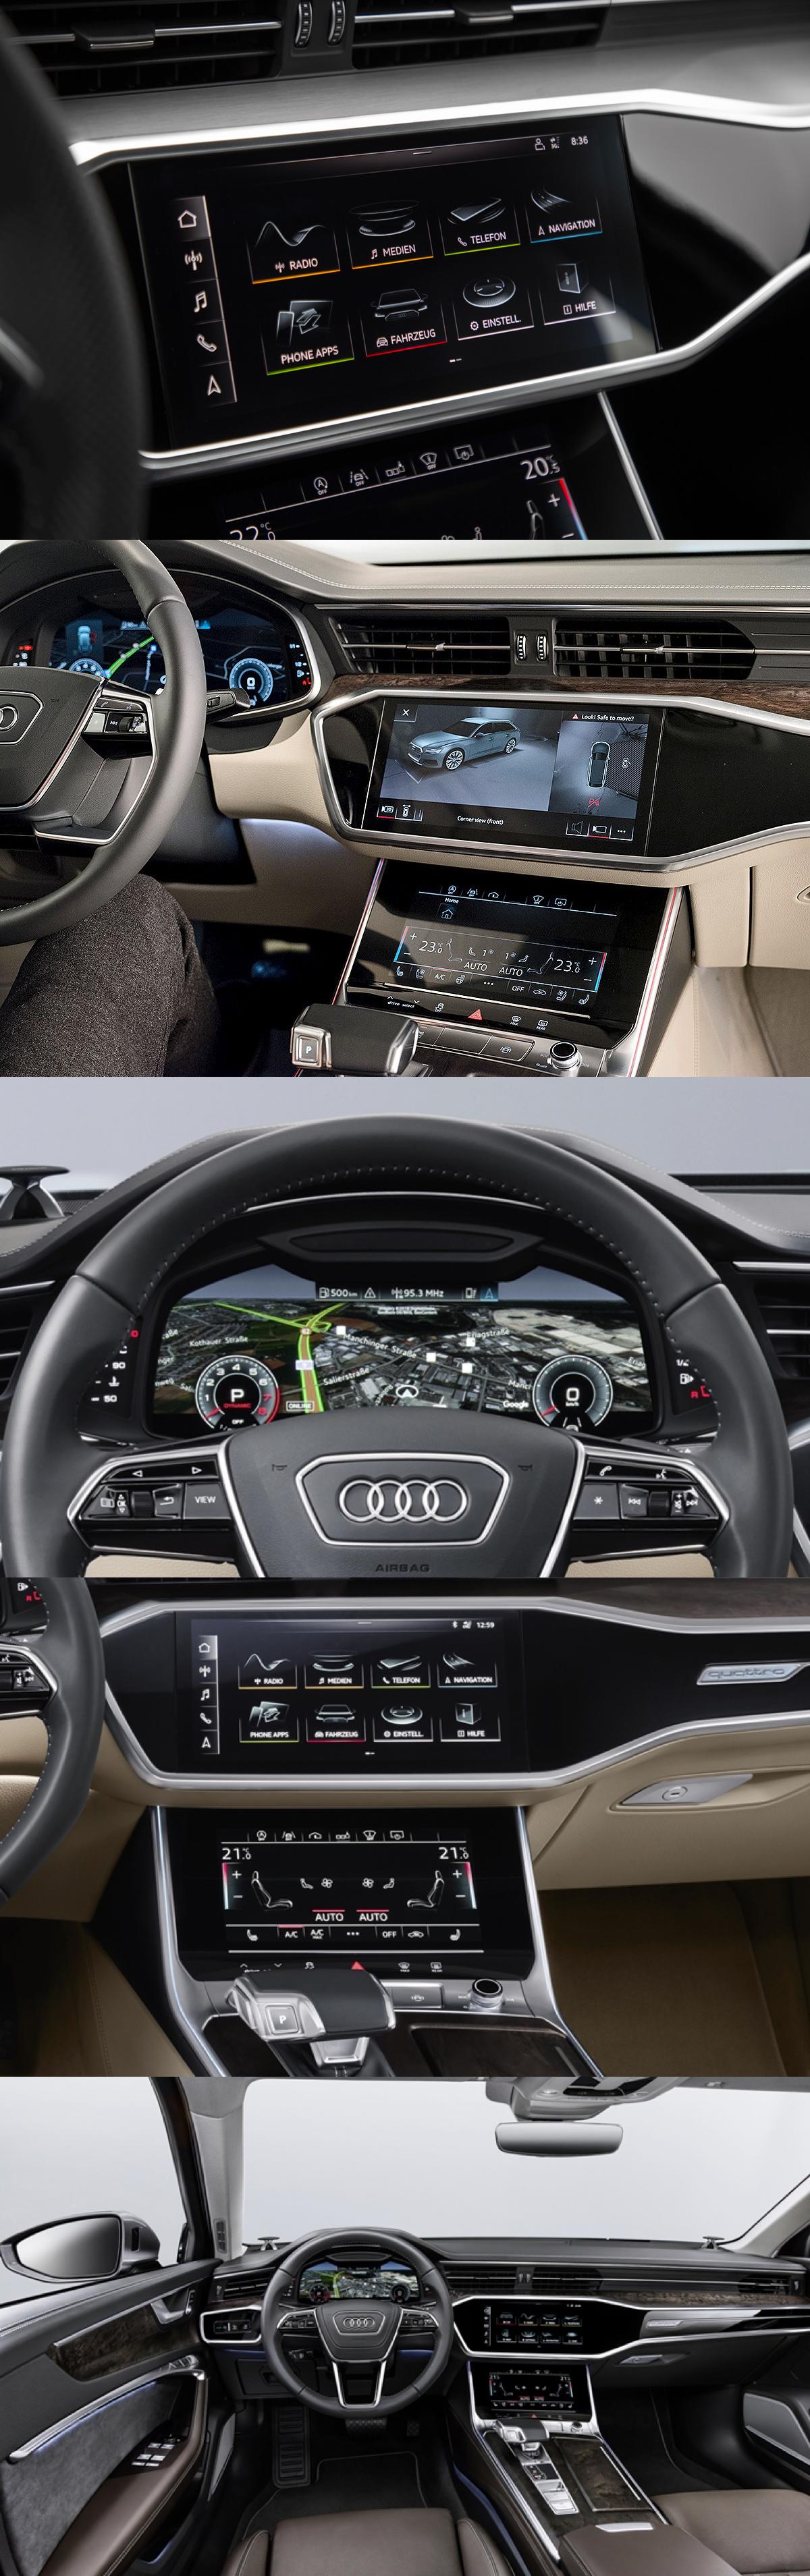 Icons Dashboard Icons Hmi Ivi Infotainment Audi A6 2018